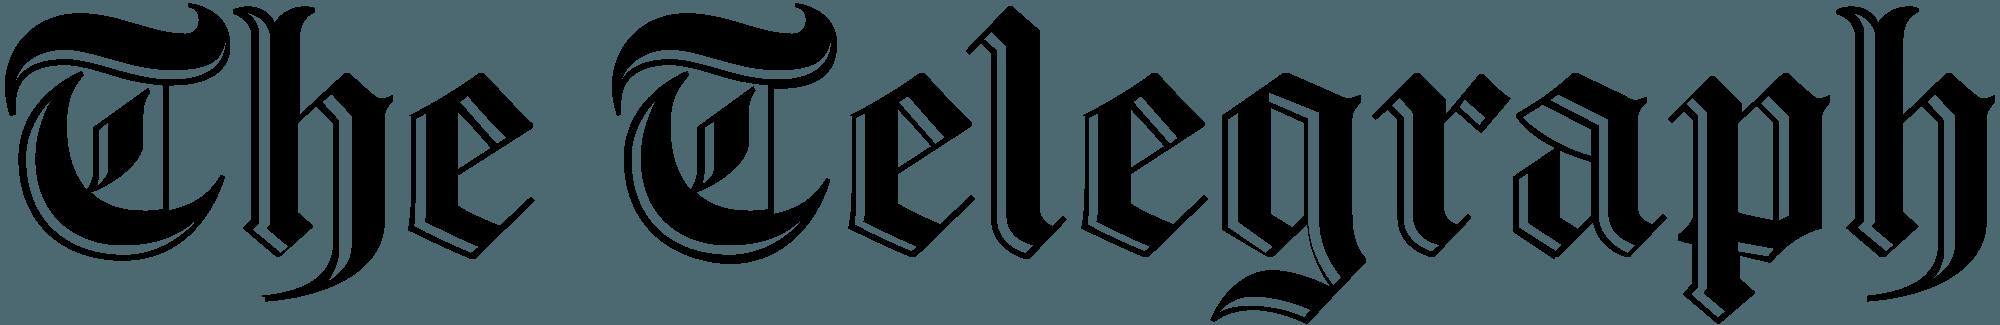 Telegraph logo